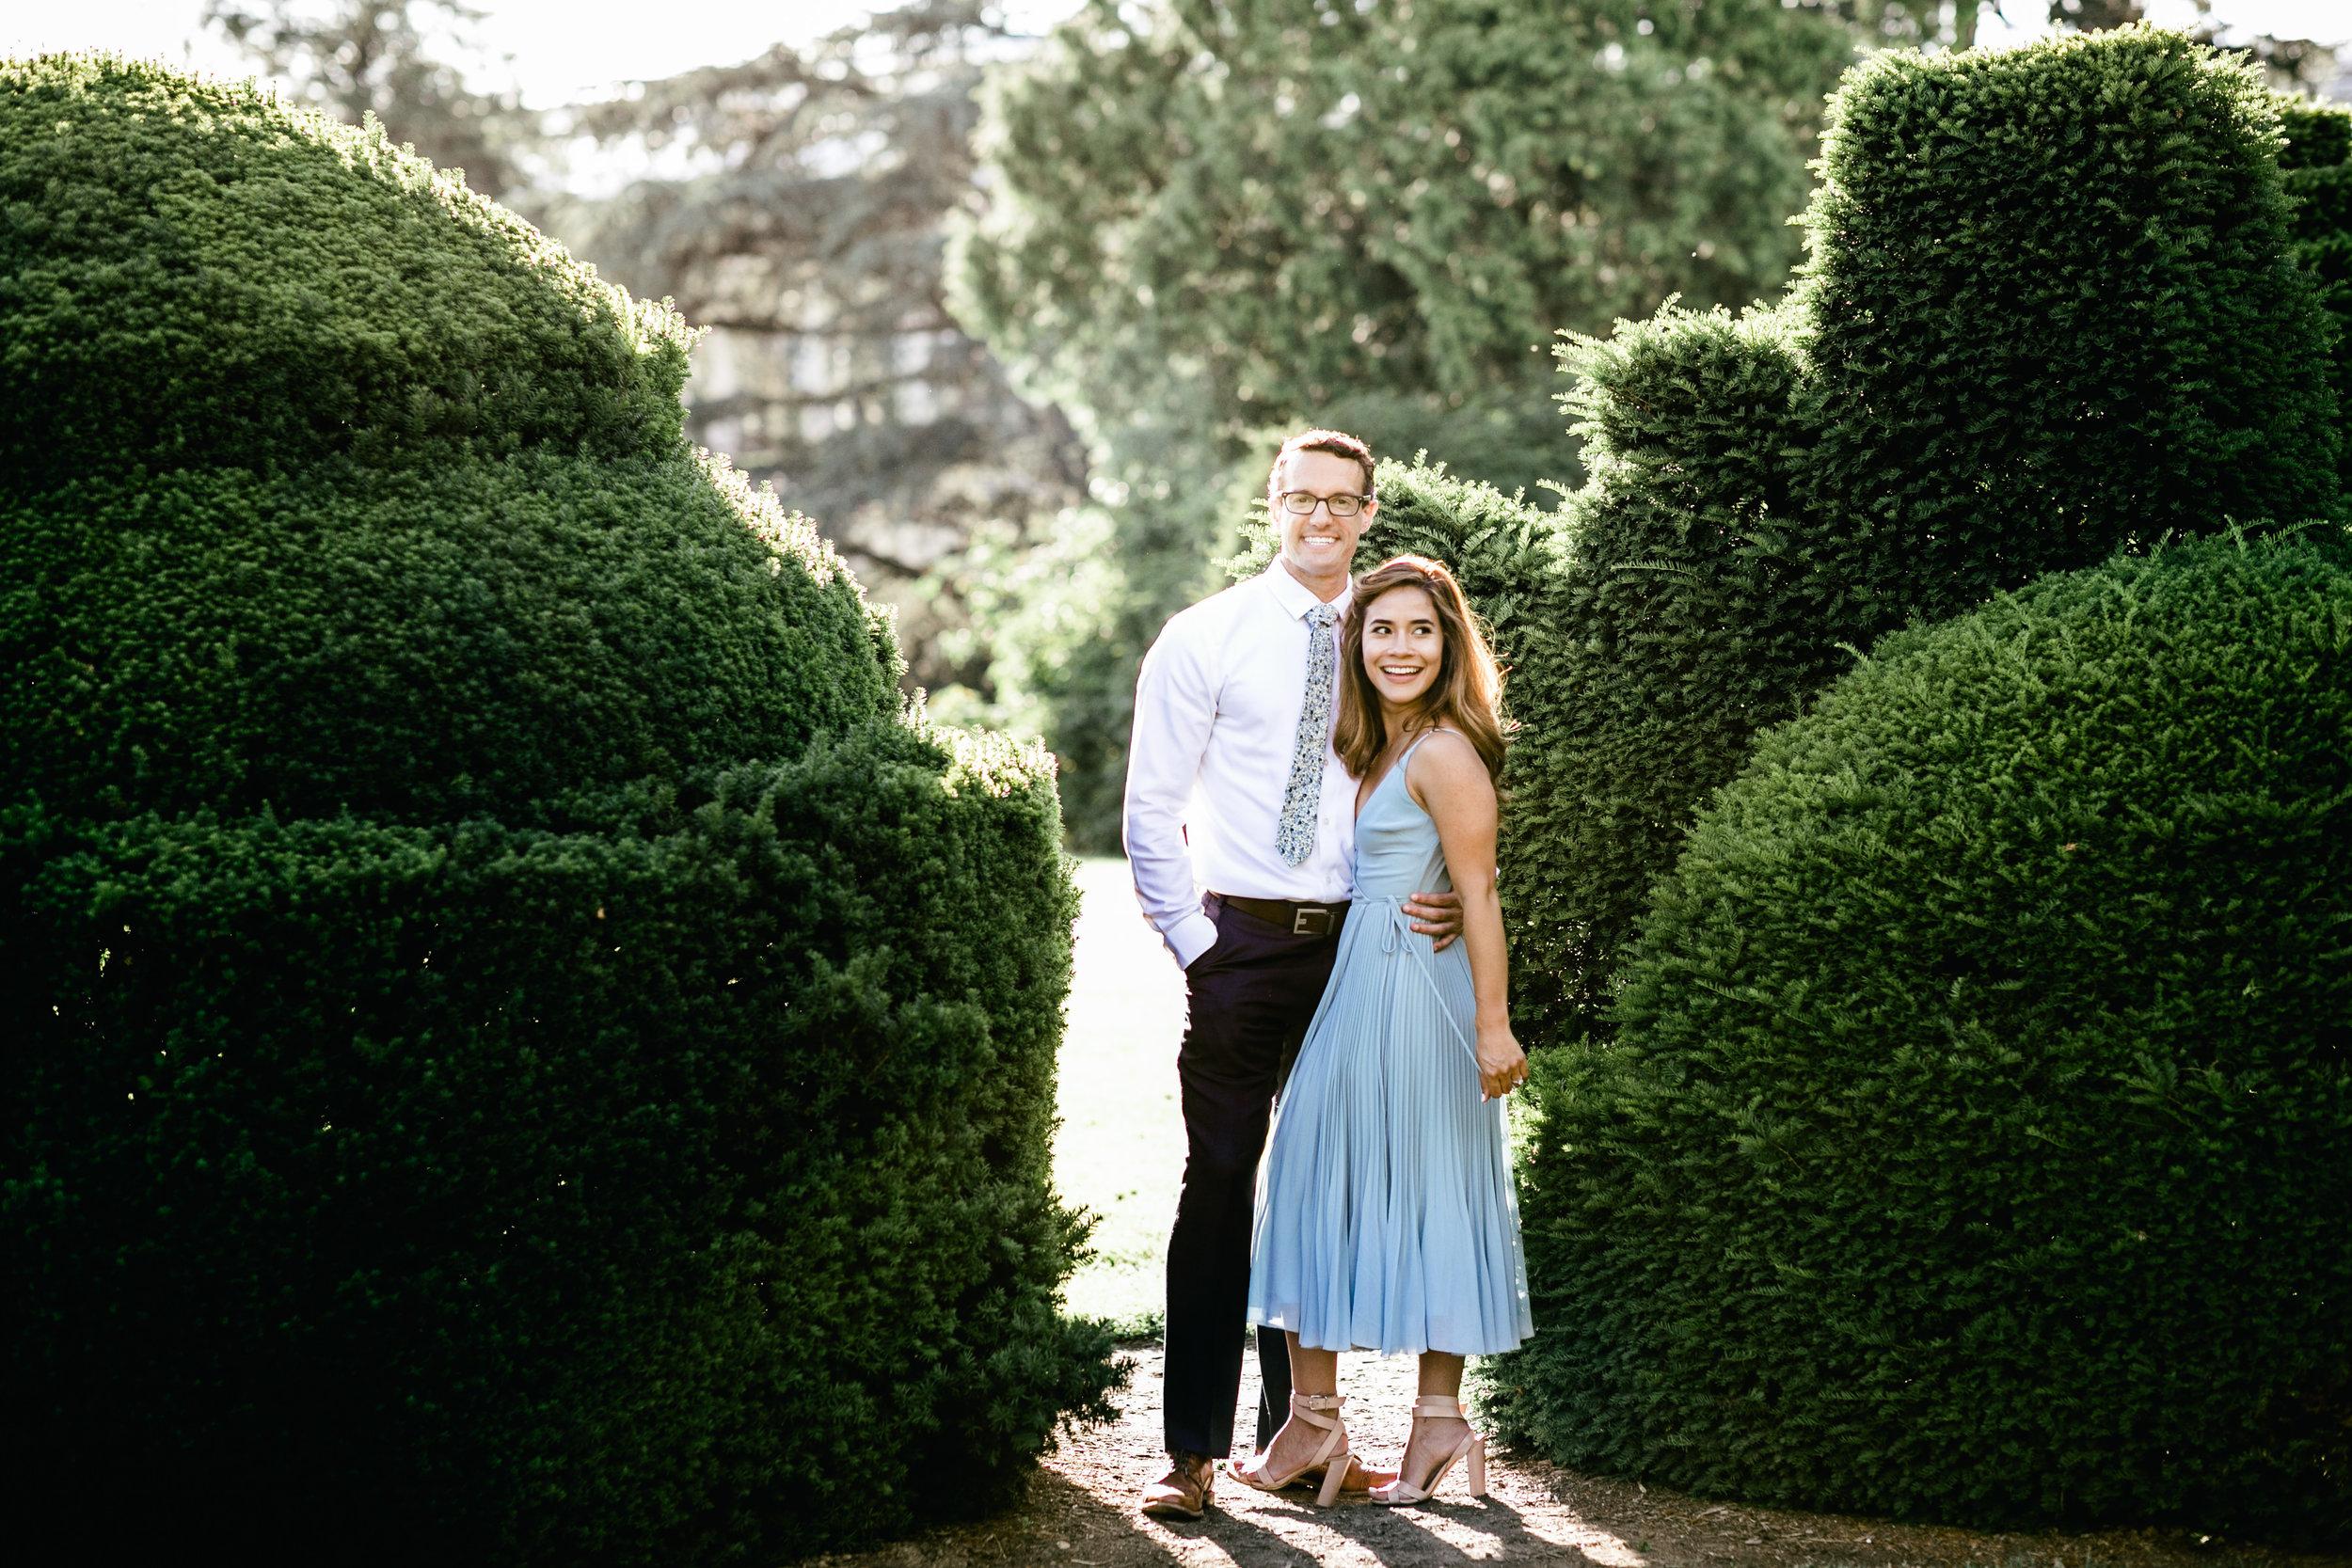 photography-natural-candid-engaged-proposal-philadelphia-wedding-longwood gardends-nature-flowers-modern-lifestyle-24.JPG